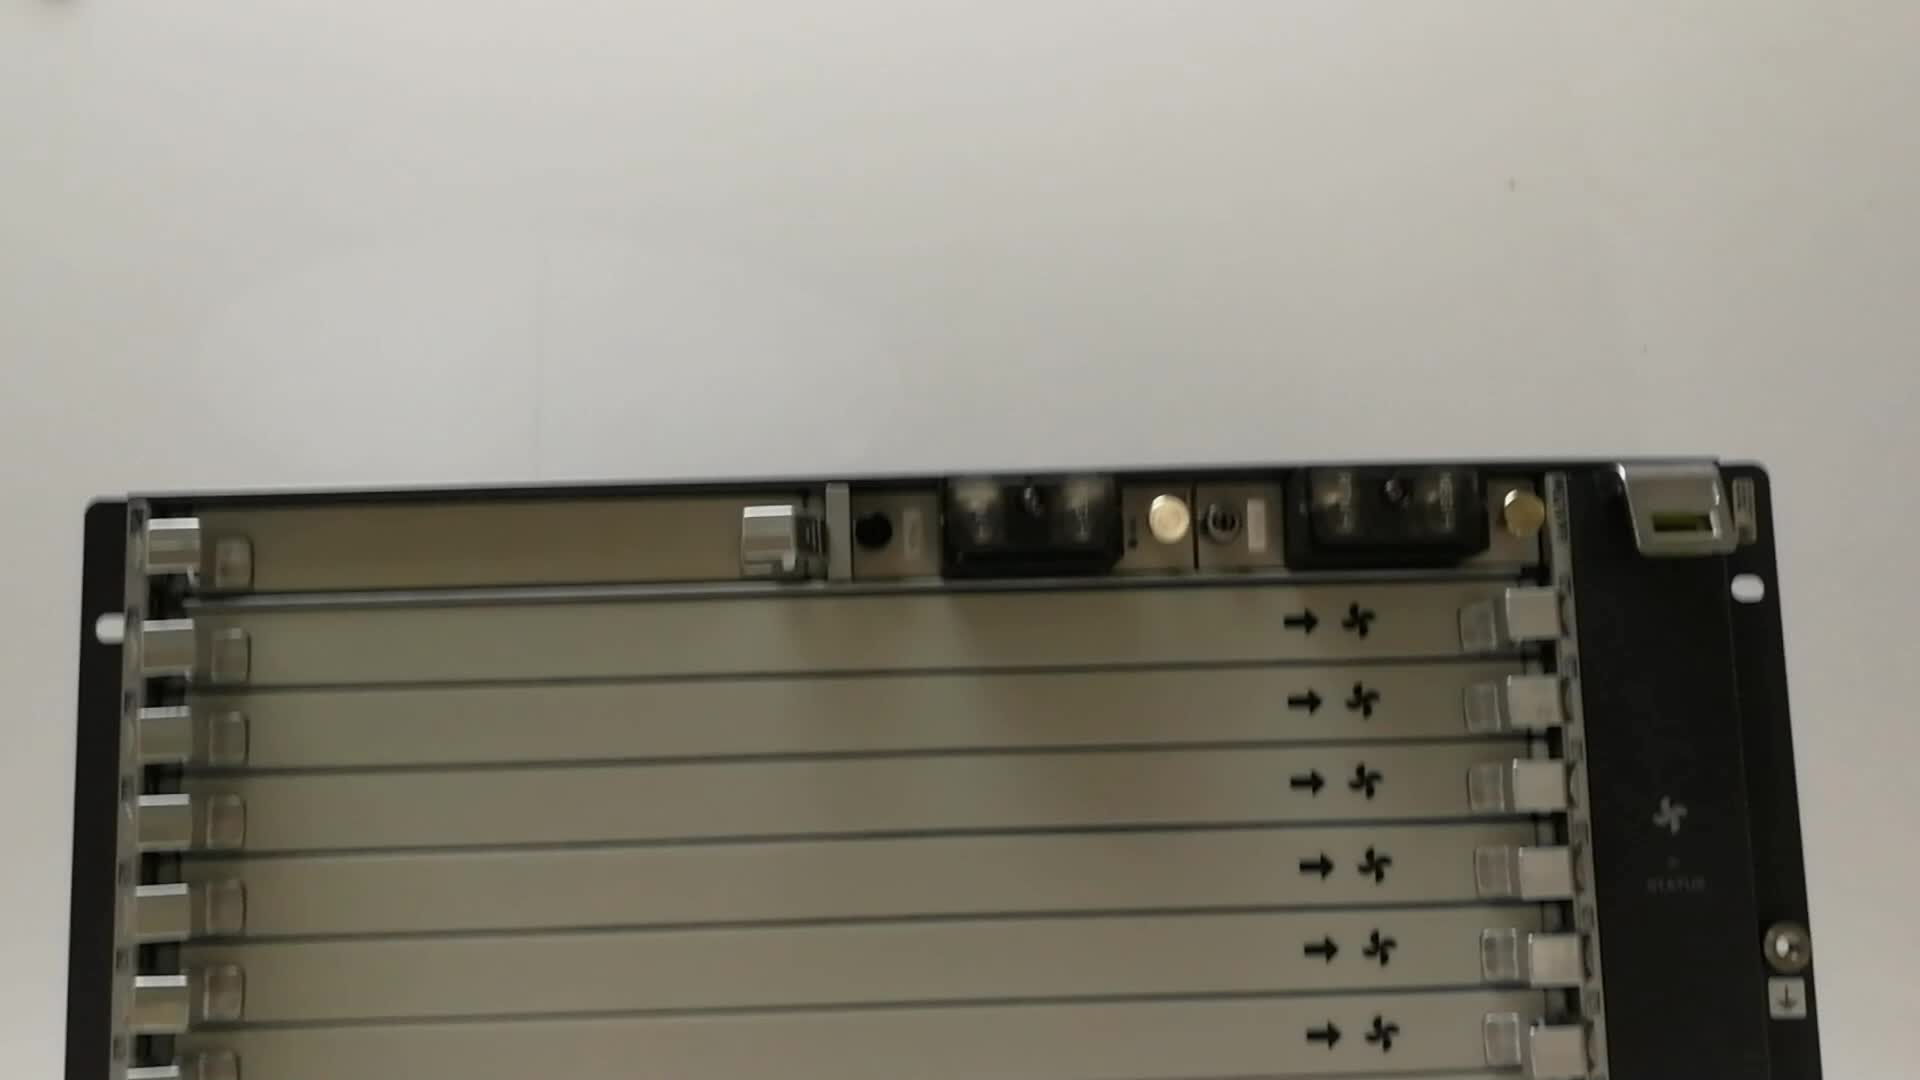 Nuevo Modelo de Huawei Ma5800 serie Ftth Original Huawei Ma5800-X15 OLT